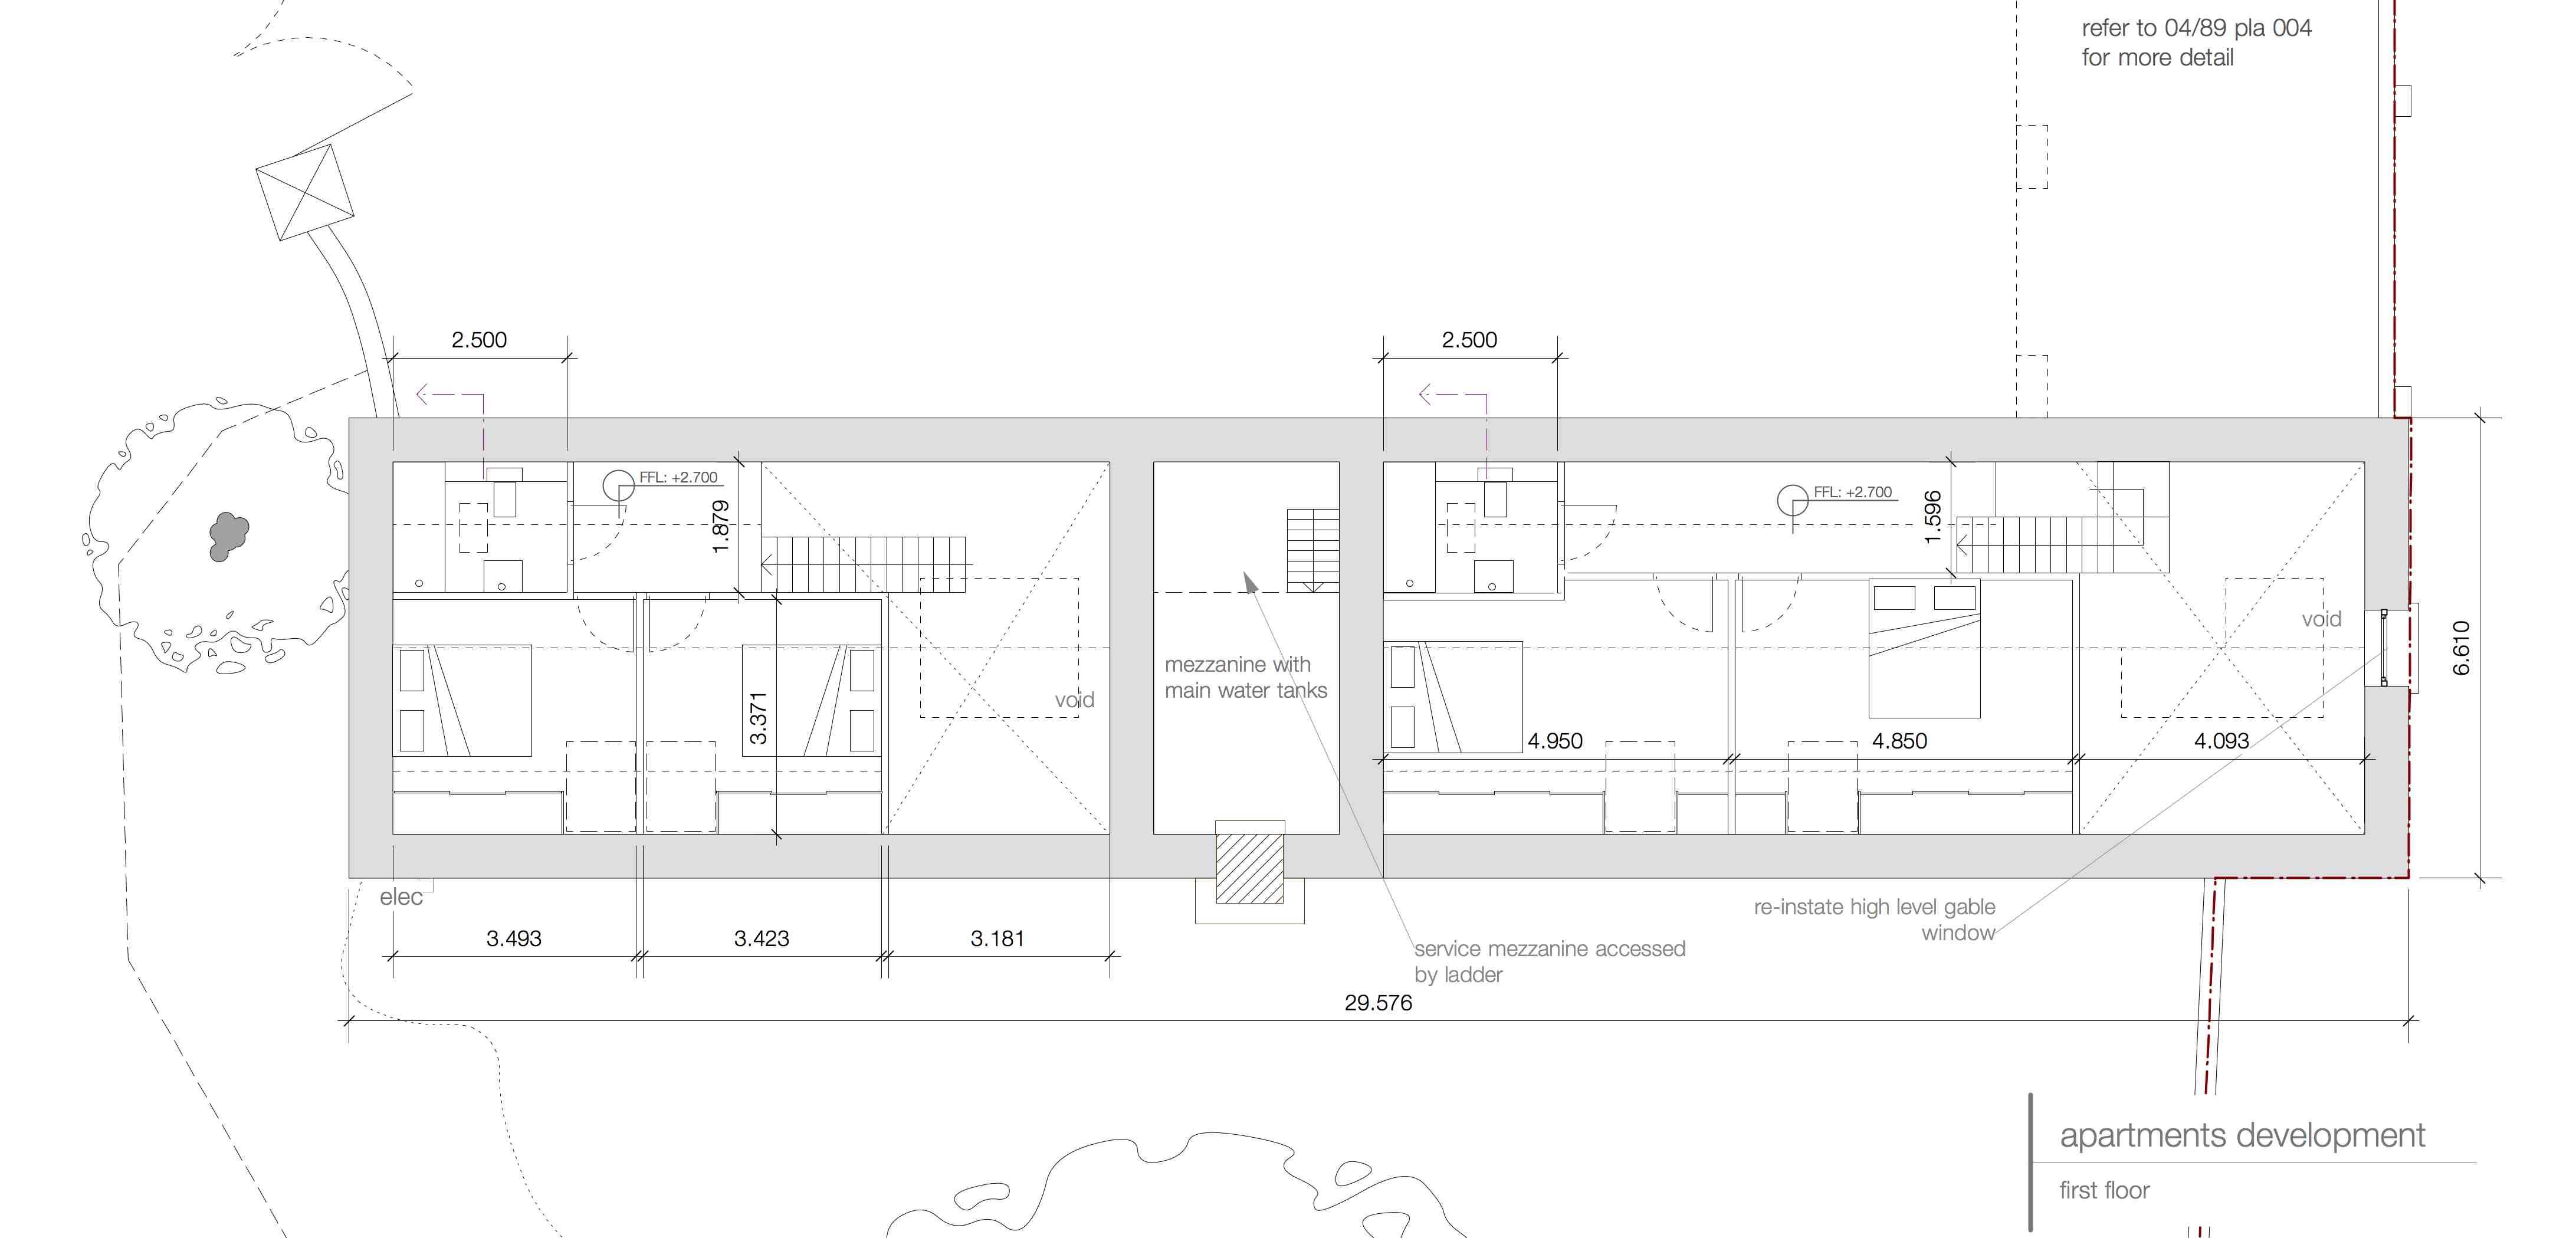 apartments development ff